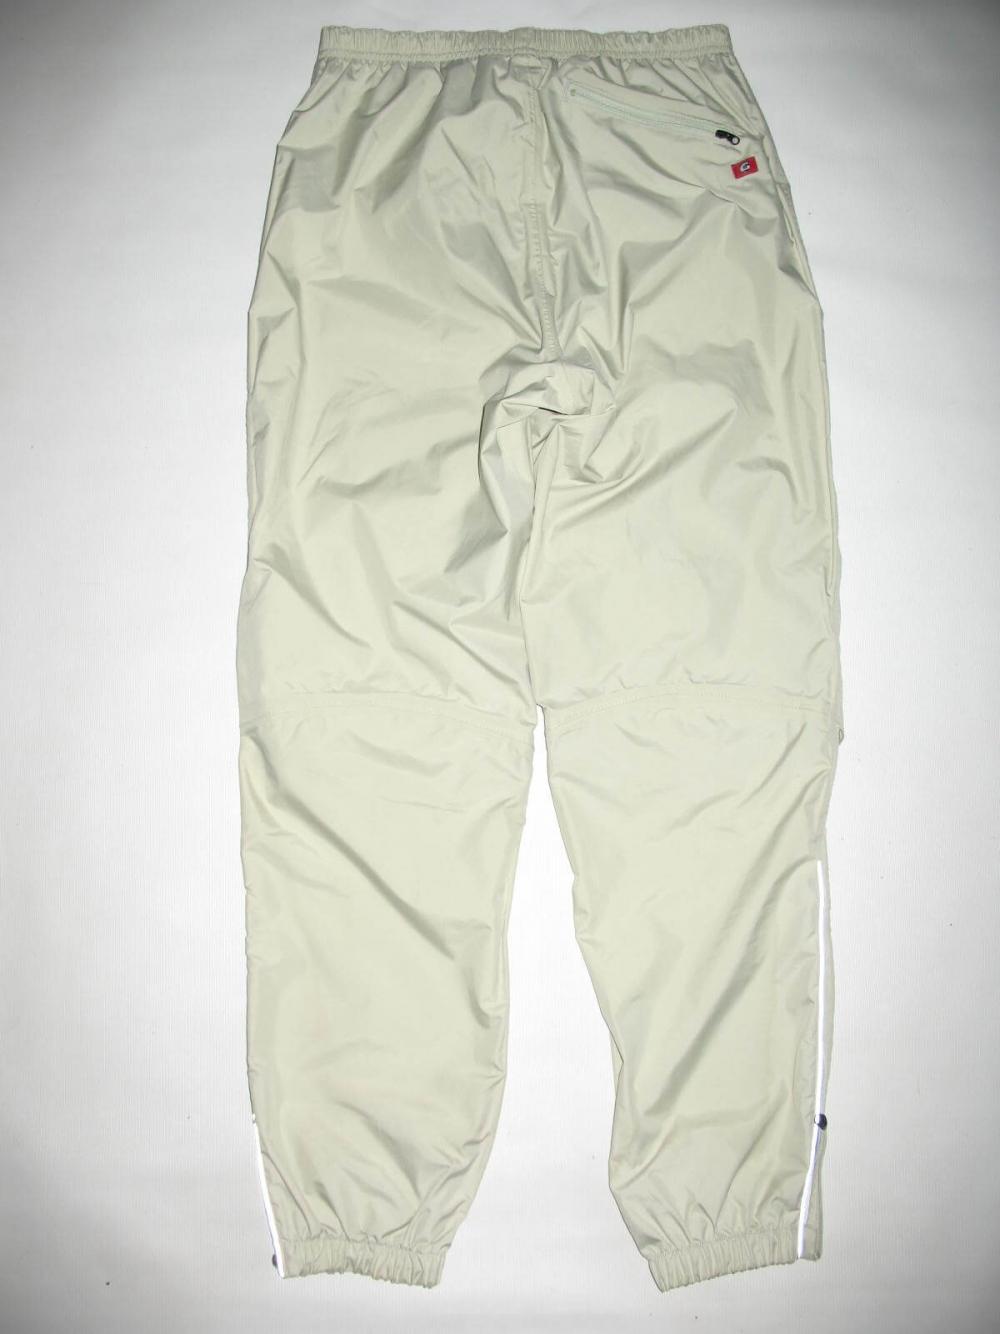 Штаны GRANIT rain cycling pants (размер S) - 1